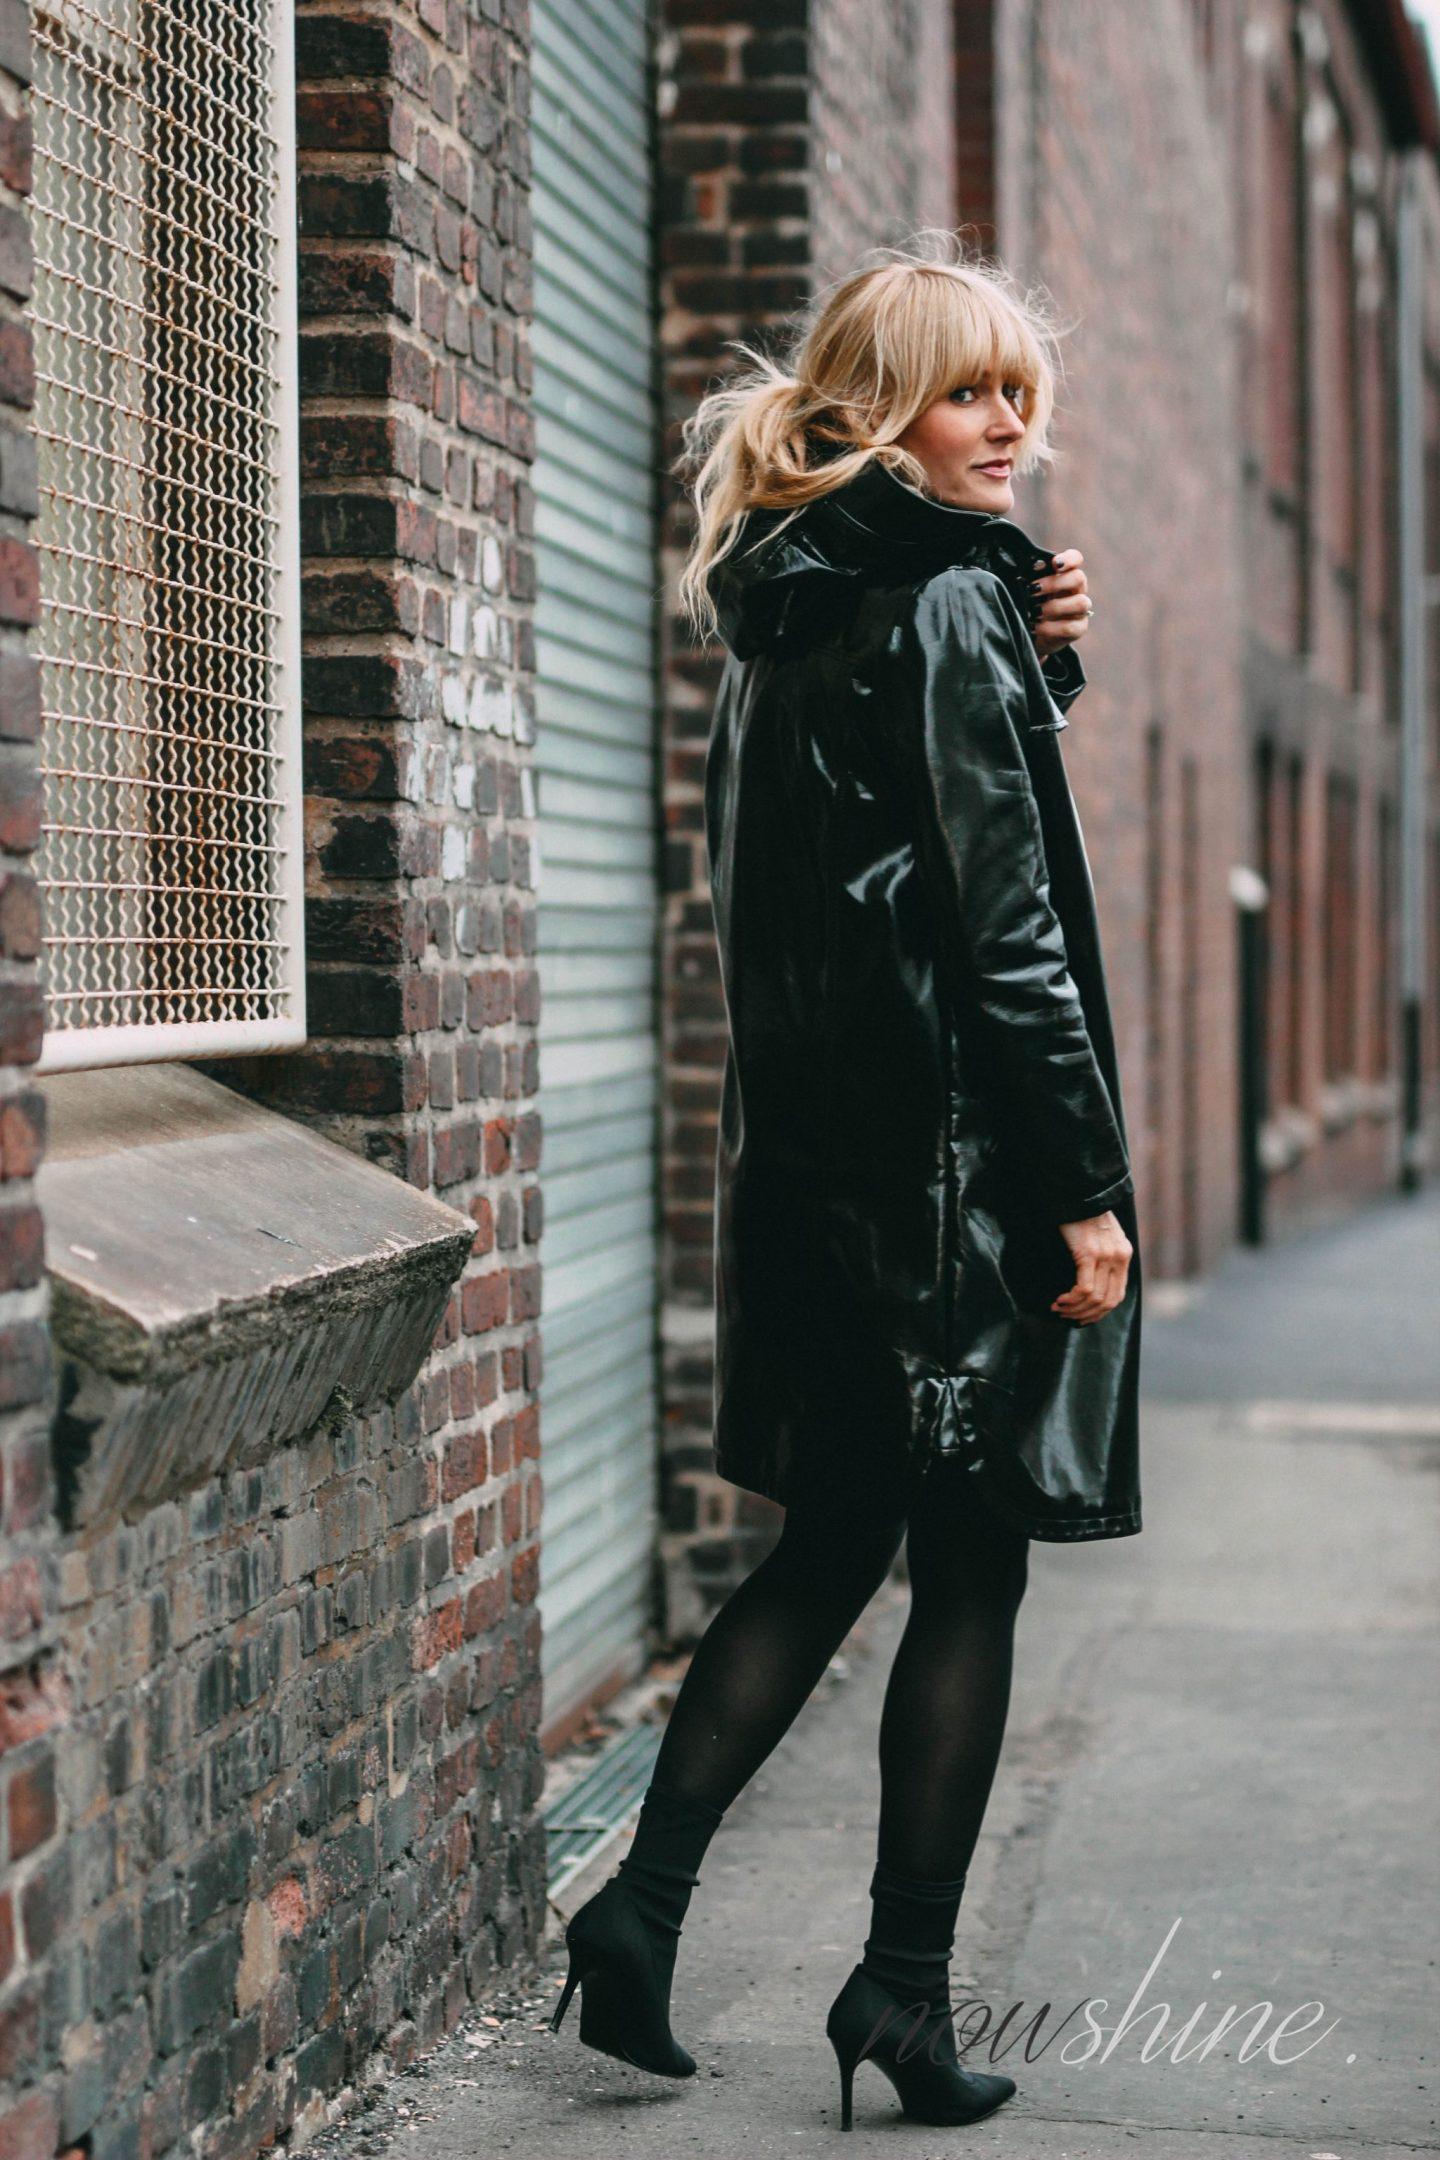 nowshine-outfit-fuer-den-osterbrunch-vinyl coat-ue40-mode-ue40-blog